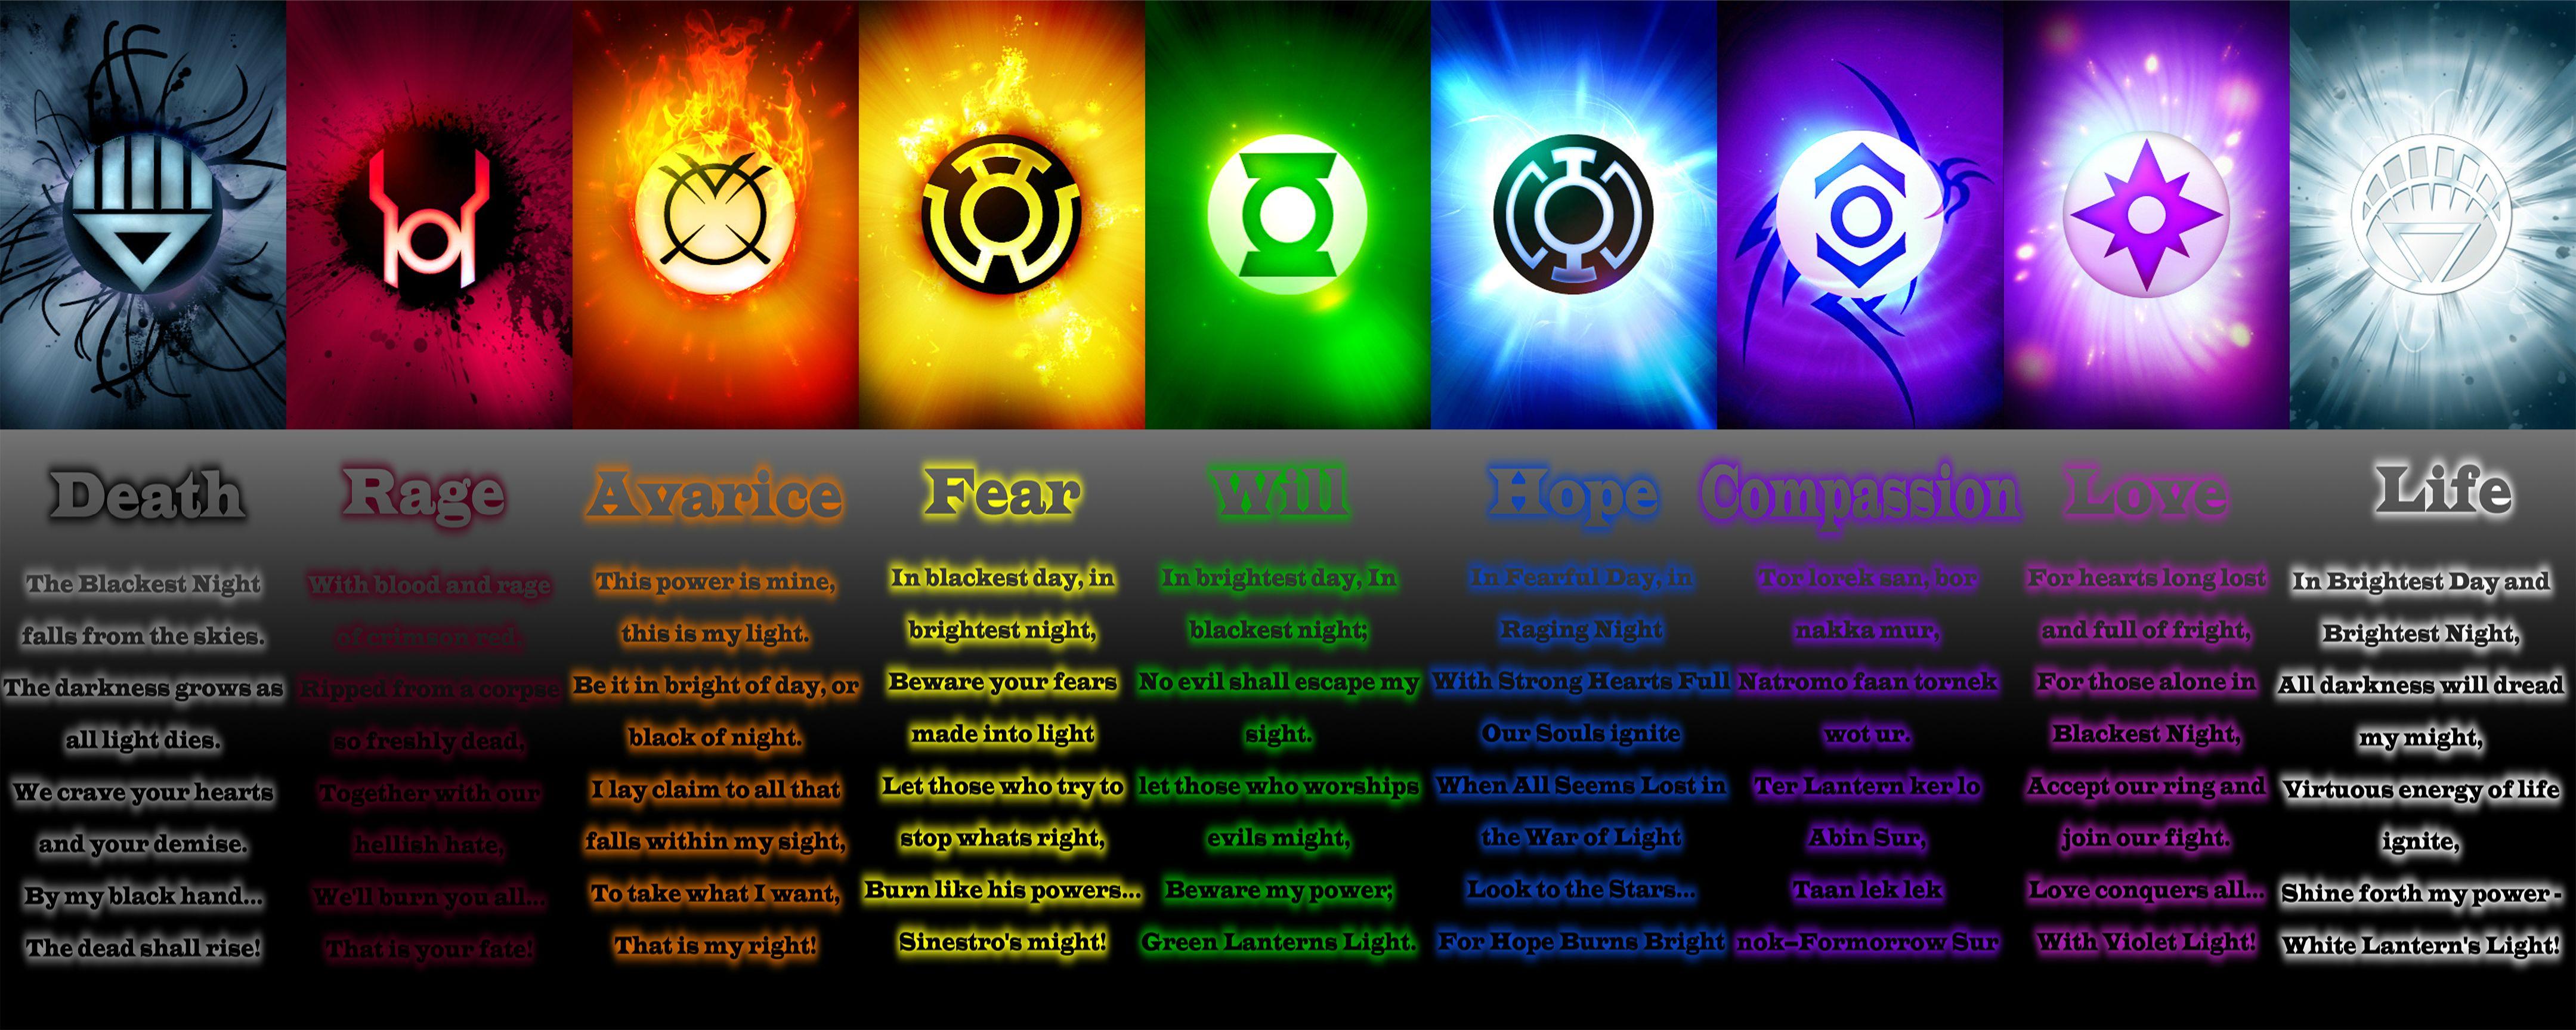 Green Lantern Vol 4 25  DC Database  FANDOM powered by Wikia